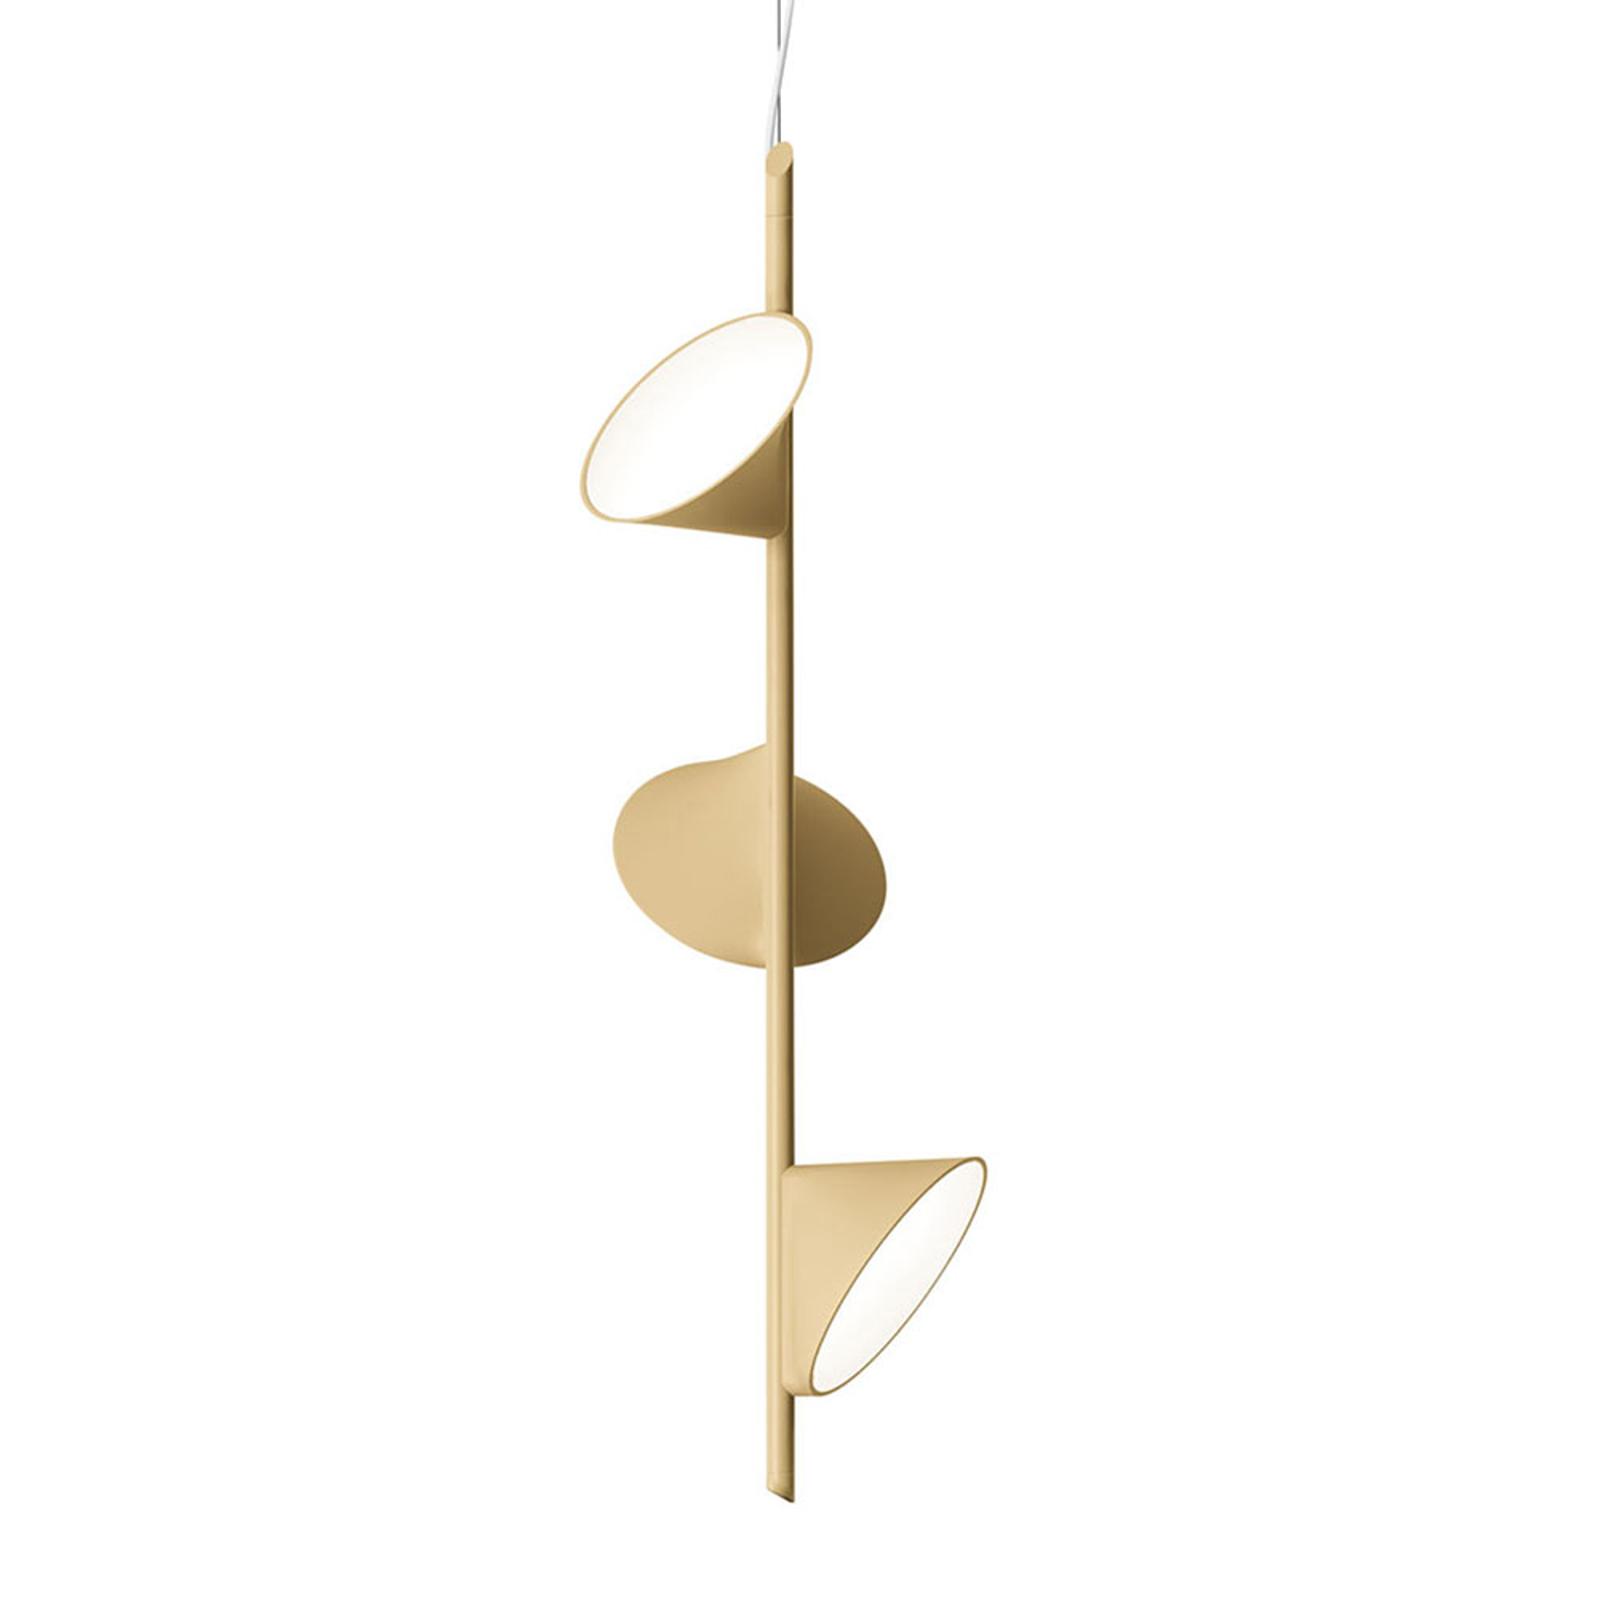 Axolight Orchid LED-Hängeleuchte, dreiflammig sand